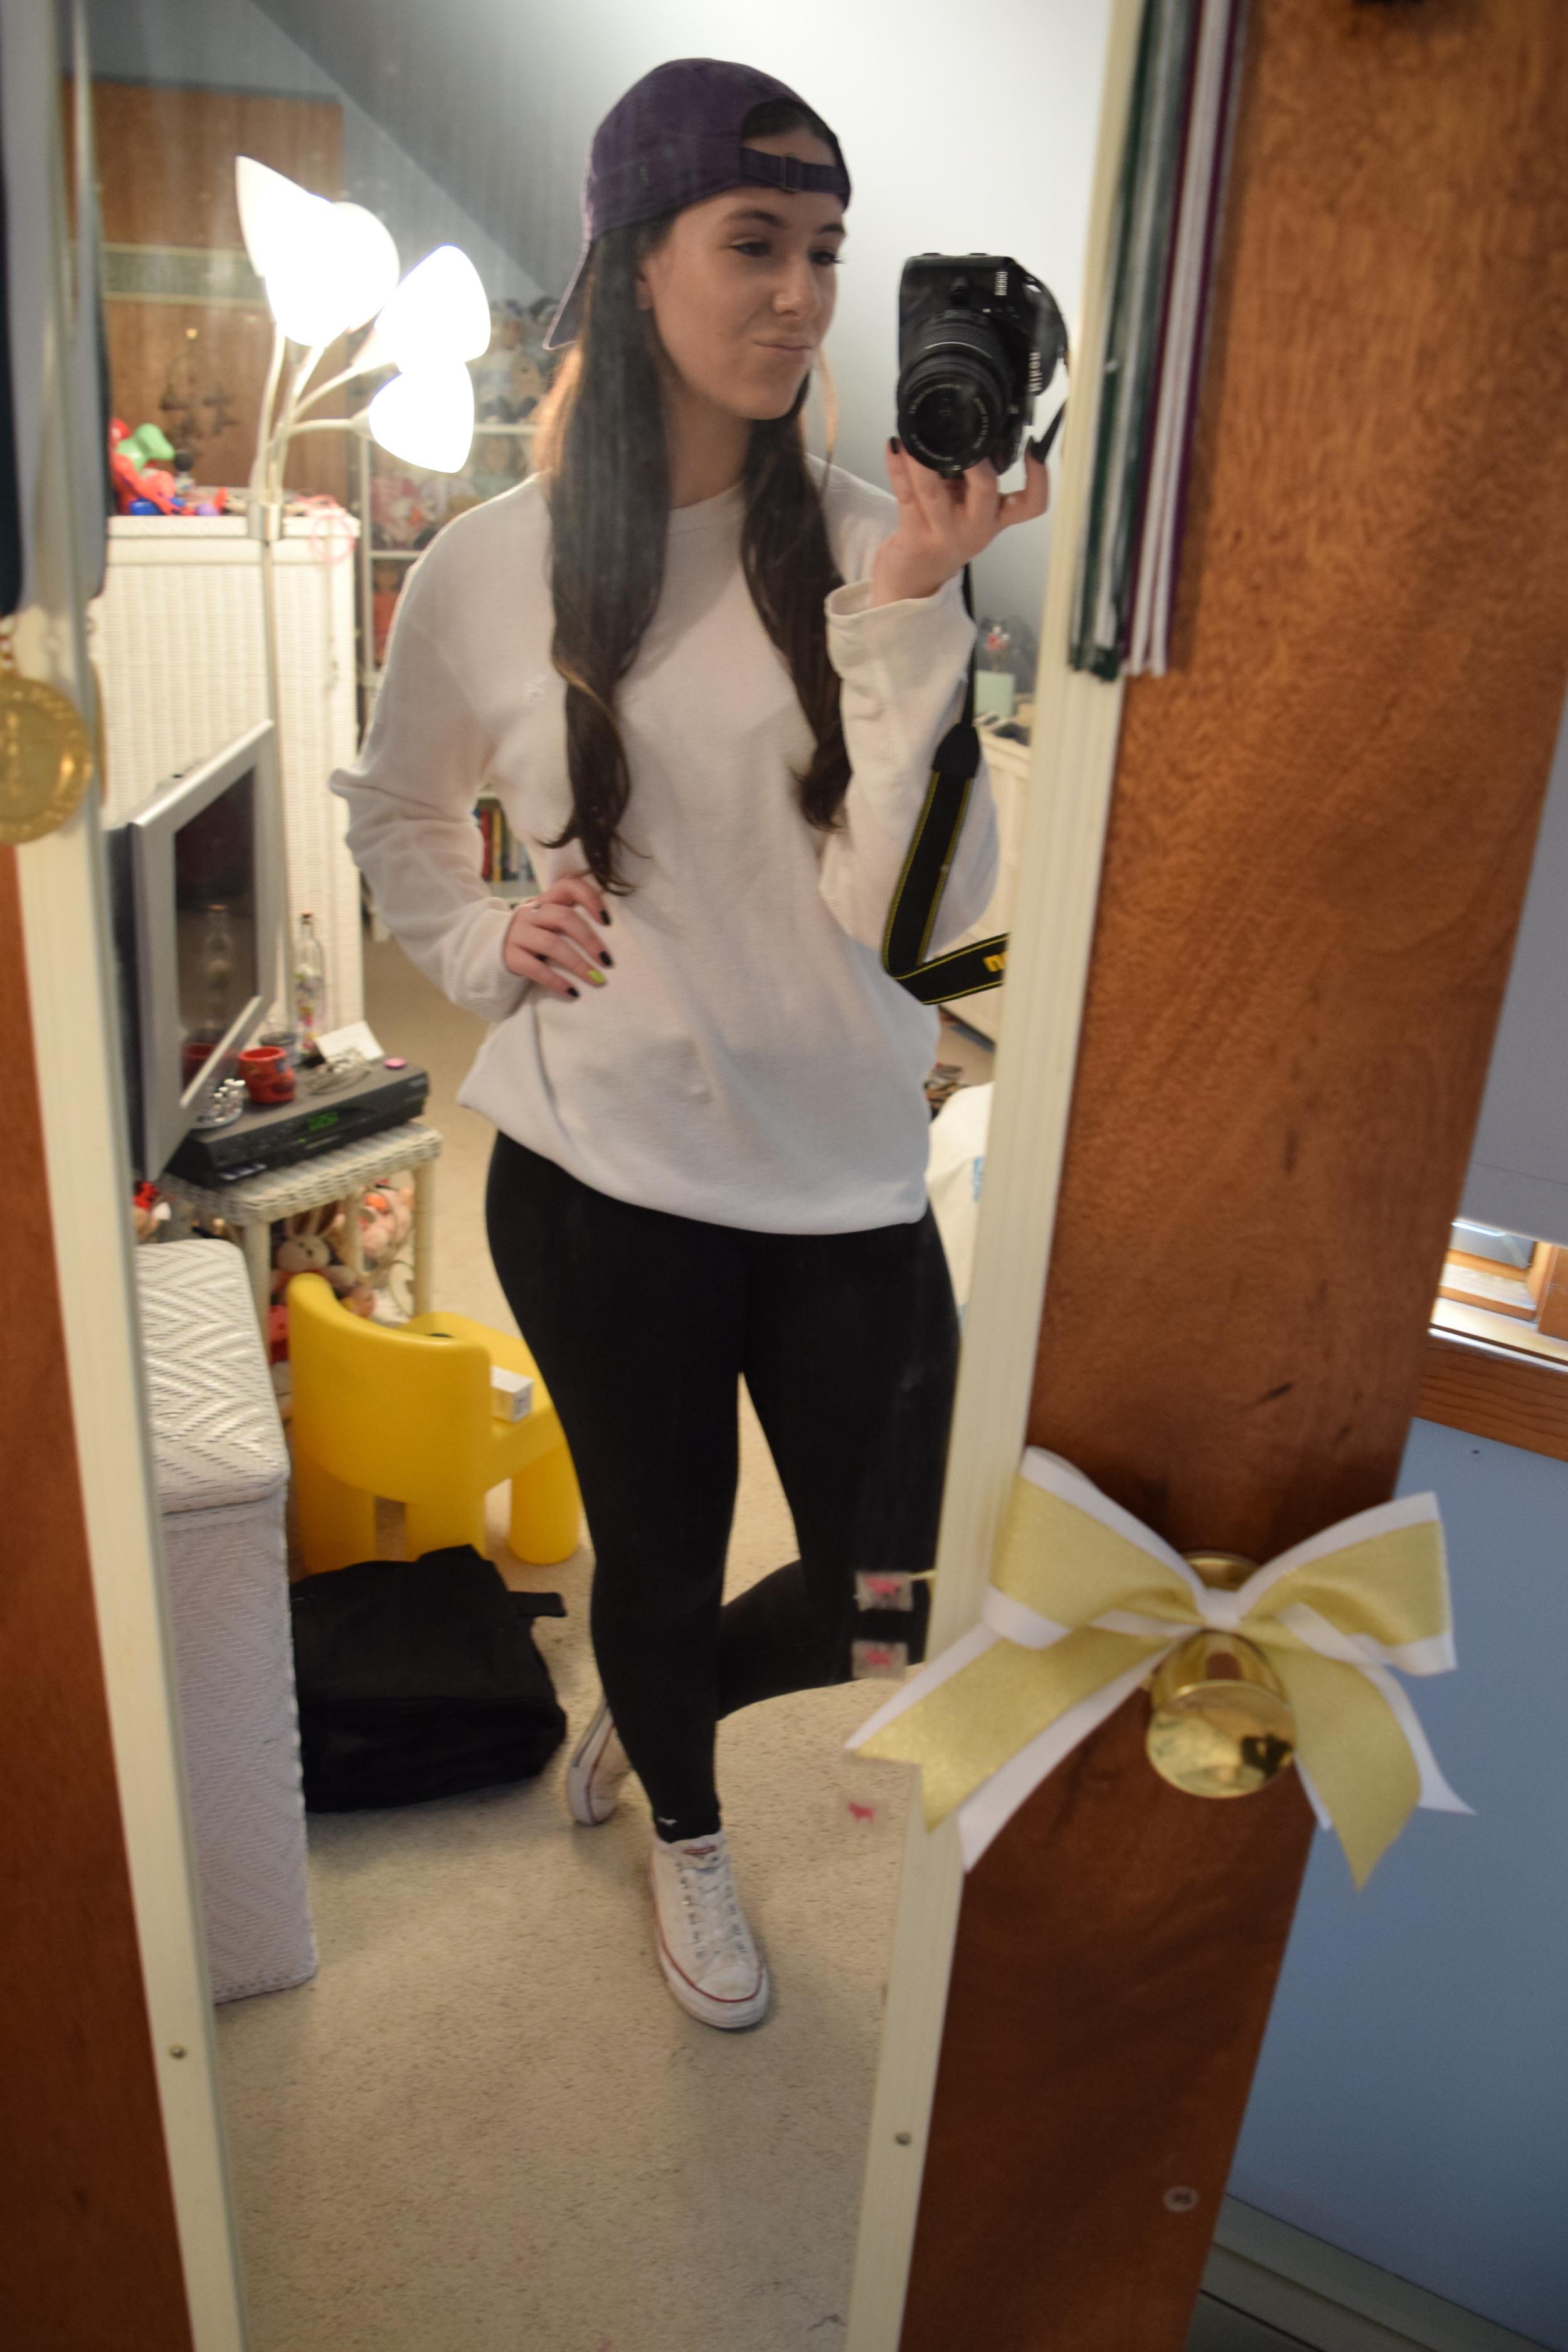 Aghh! My mirror's getting dirty again!